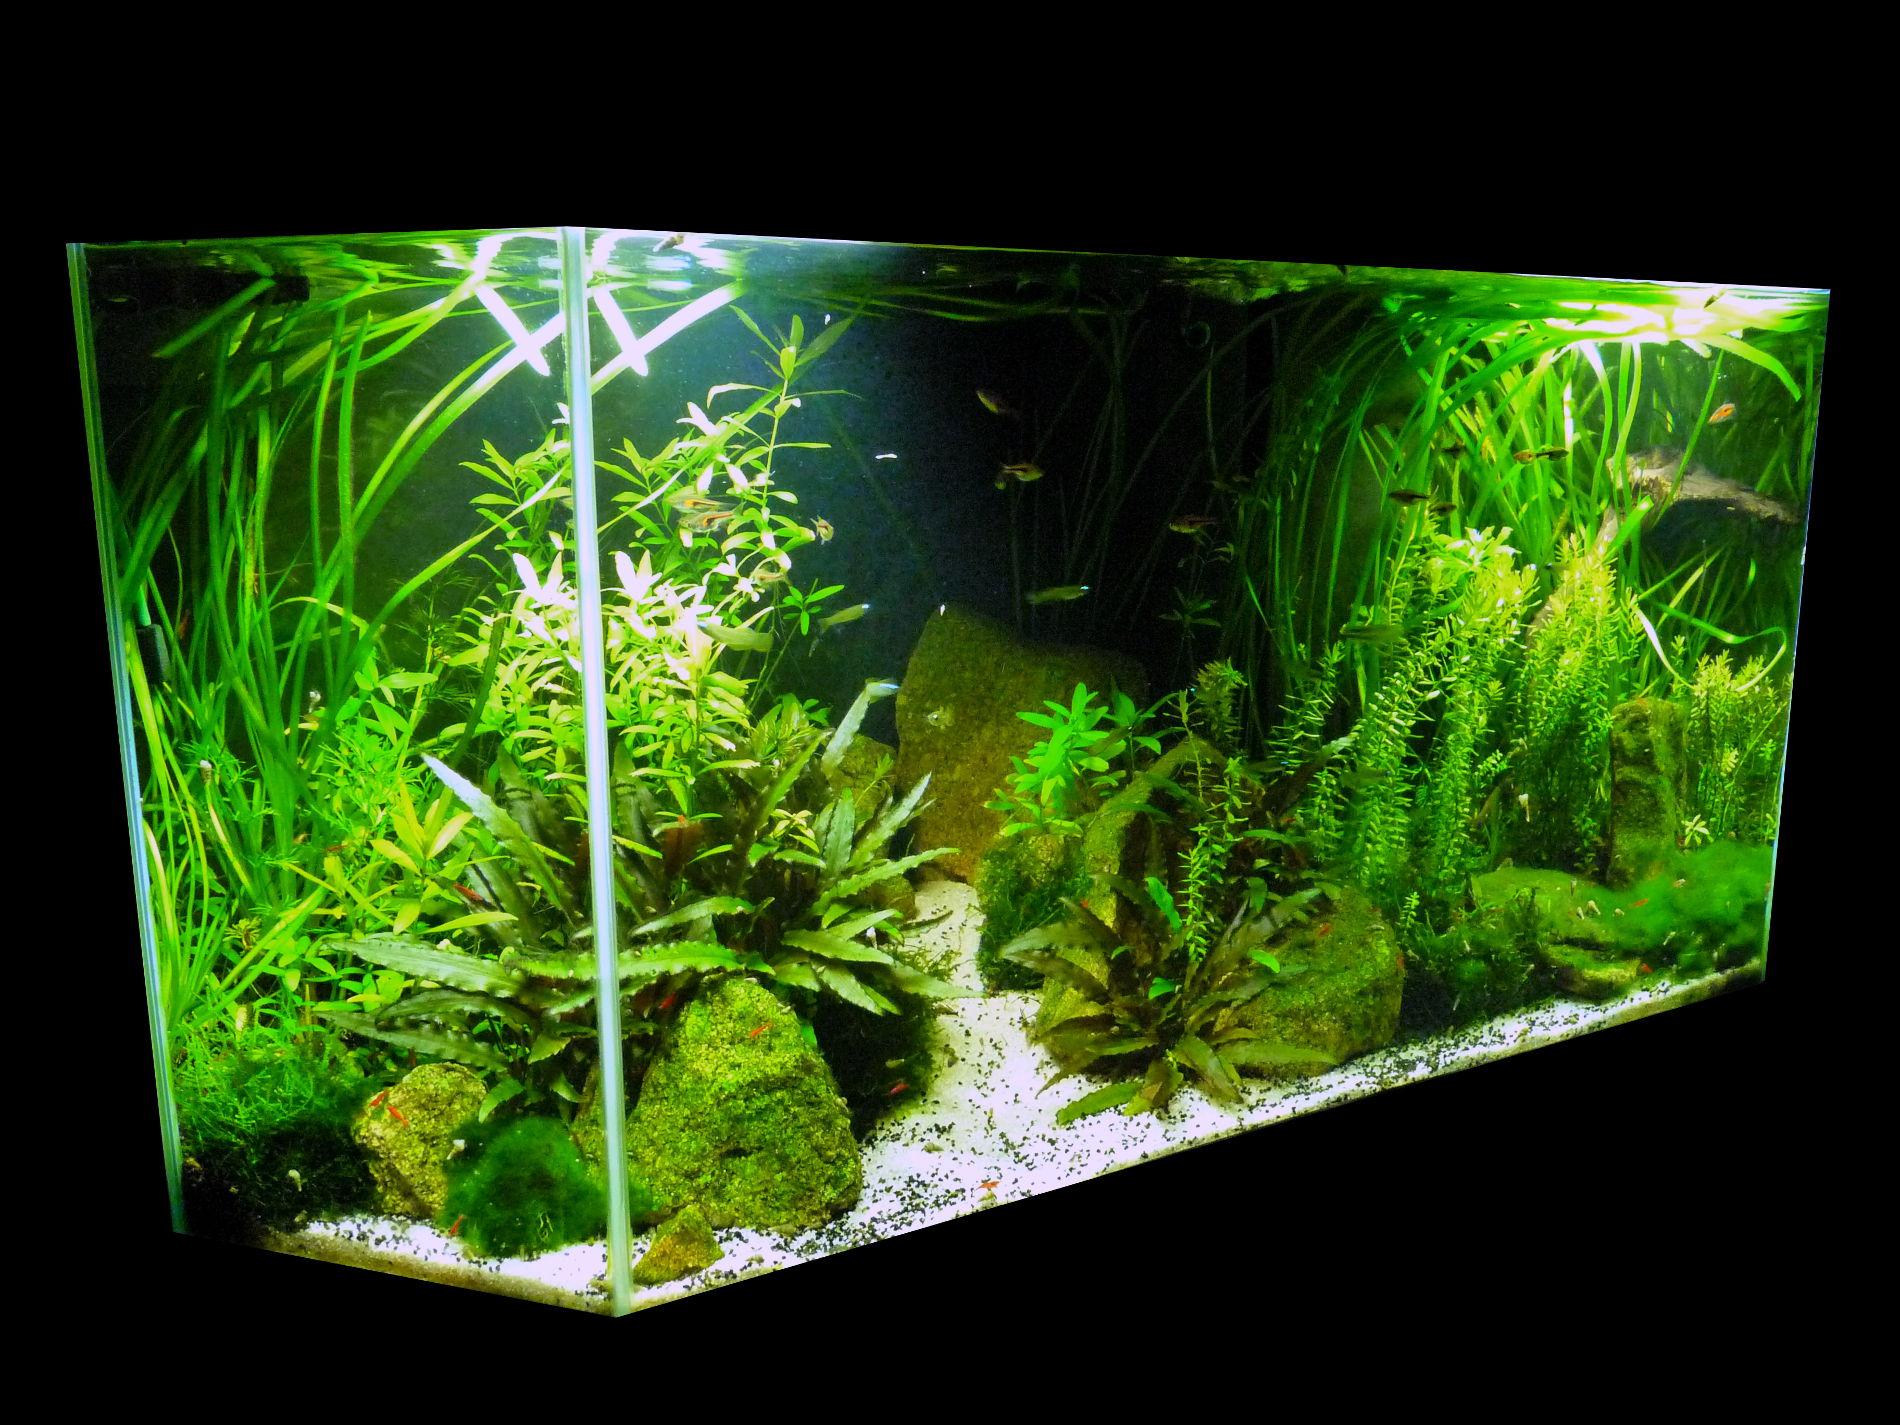 galerie mur v g tal et aquariums sur mesure nature design. Black Bedroom Furniture Sets. Home Design Ideas